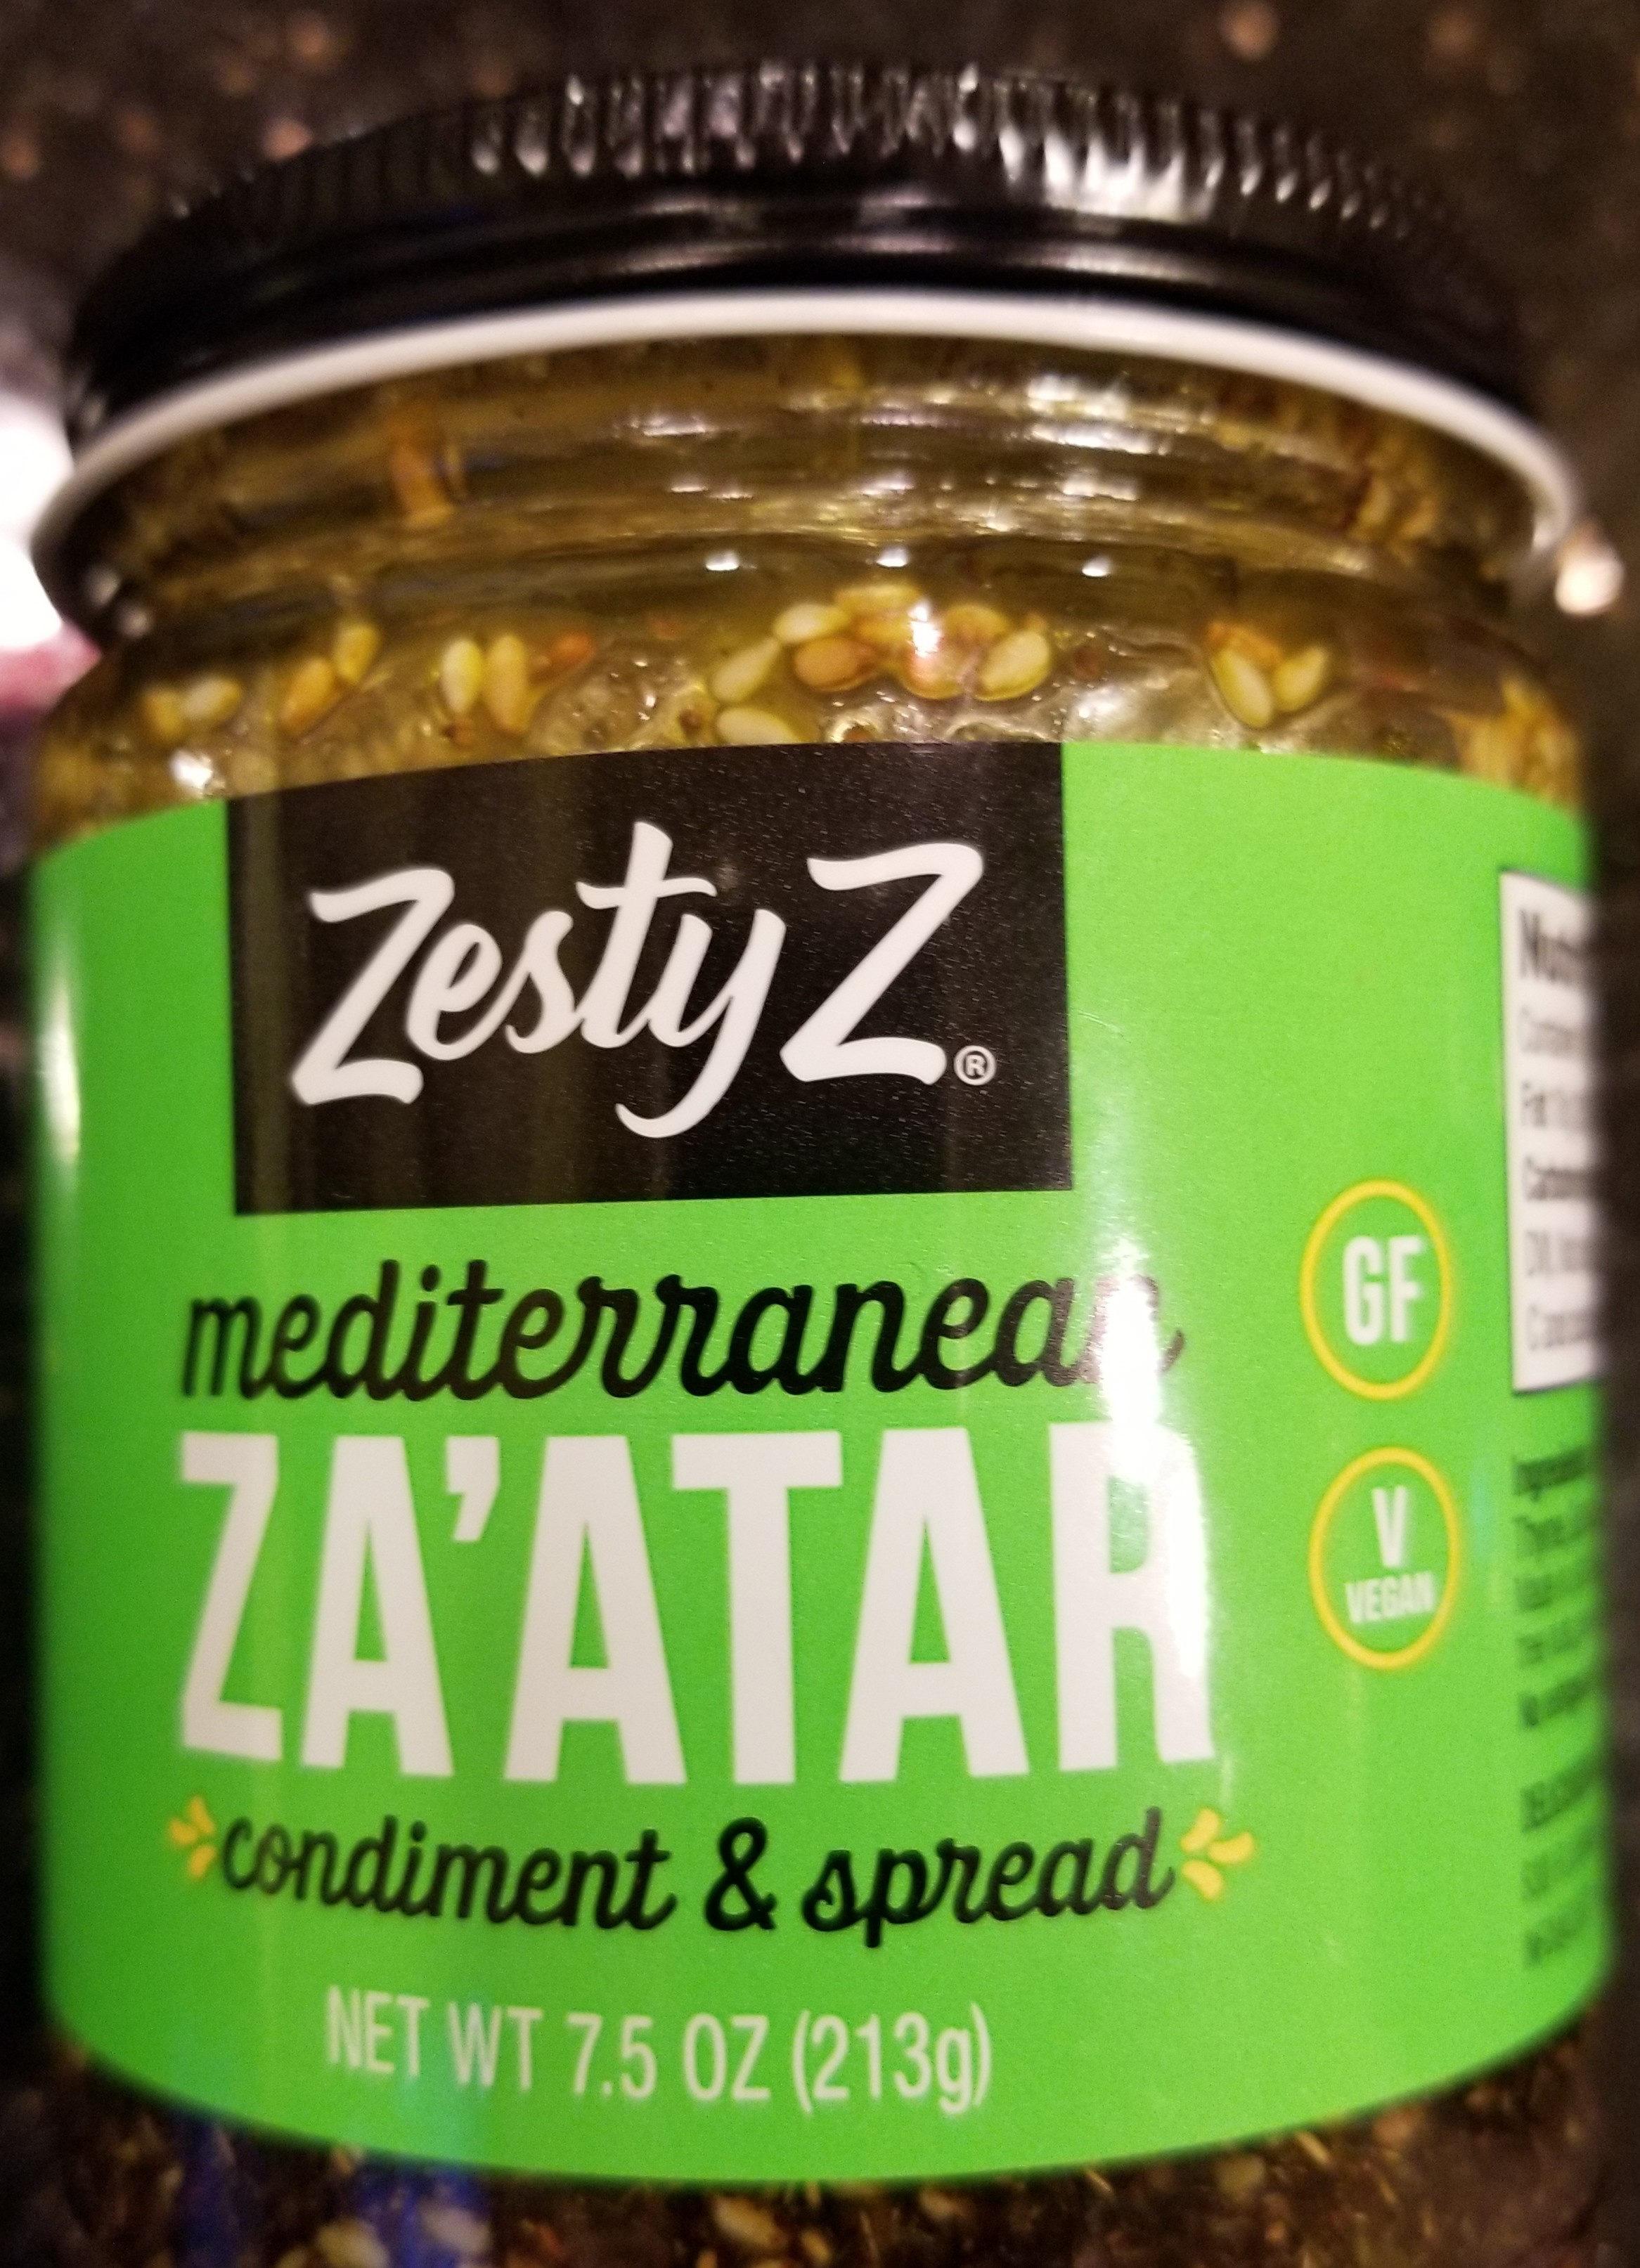 Mediterranean Za'atar - Product - en